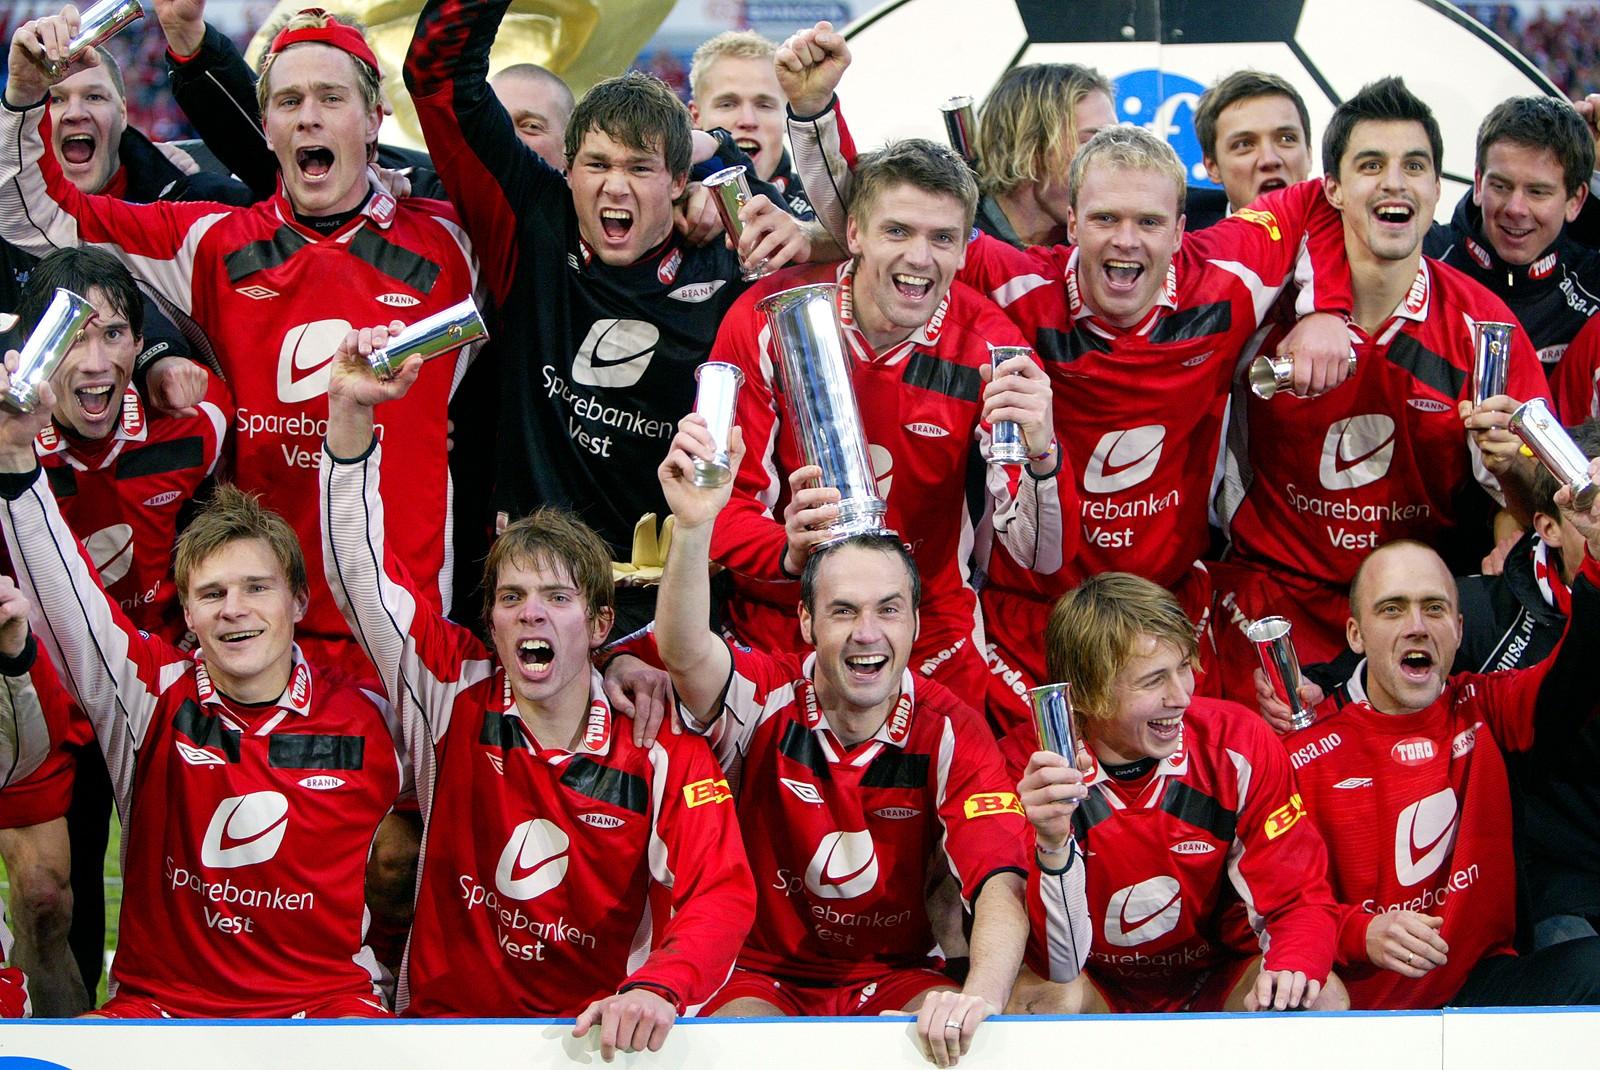 CUPMESTER: Erlend Hanstveit og de øvrige Brann-spillerne jublet hemningsløst etter seieren over Lyn på Ullevaal høsten 2004.